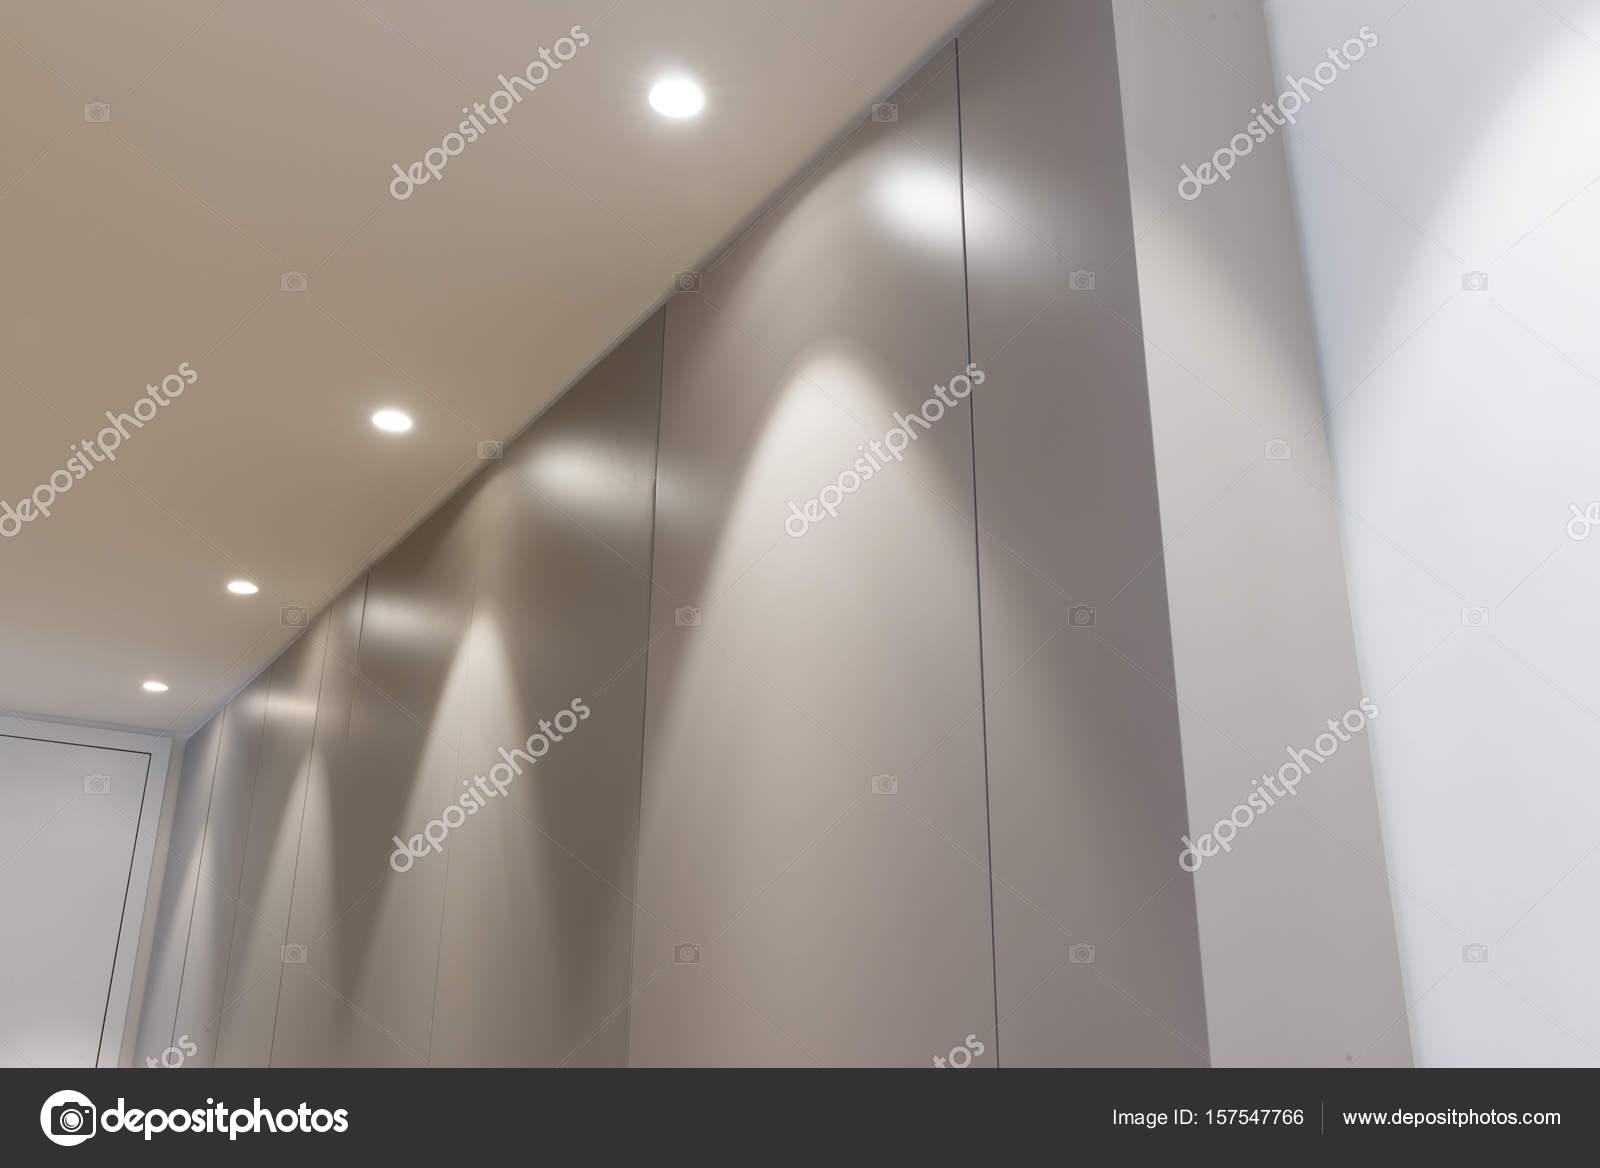 büro tür paneelwand mit beleuchtung — stockfoto © stock